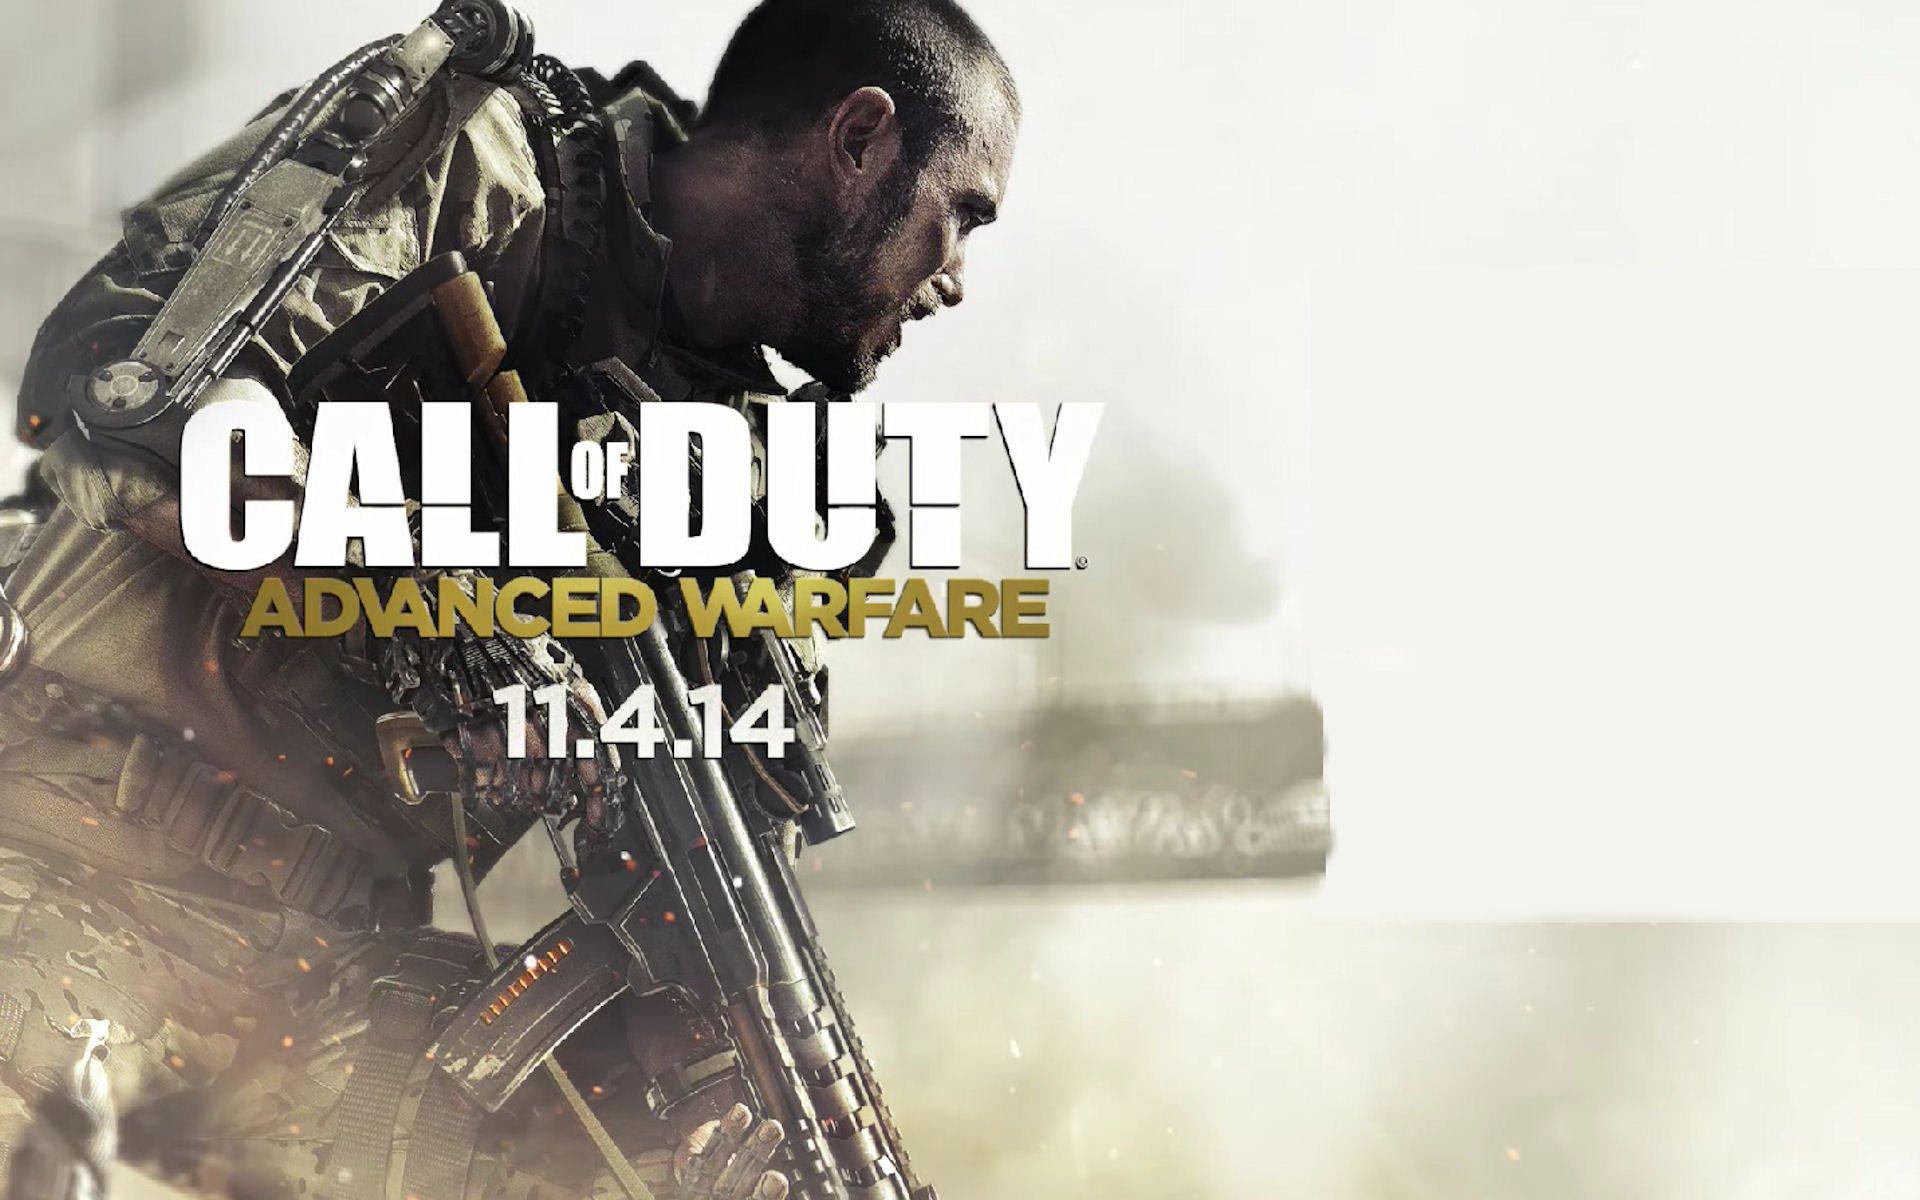 Оценки шутера Call of Duty: Advanced Warfare. - Изображение 1